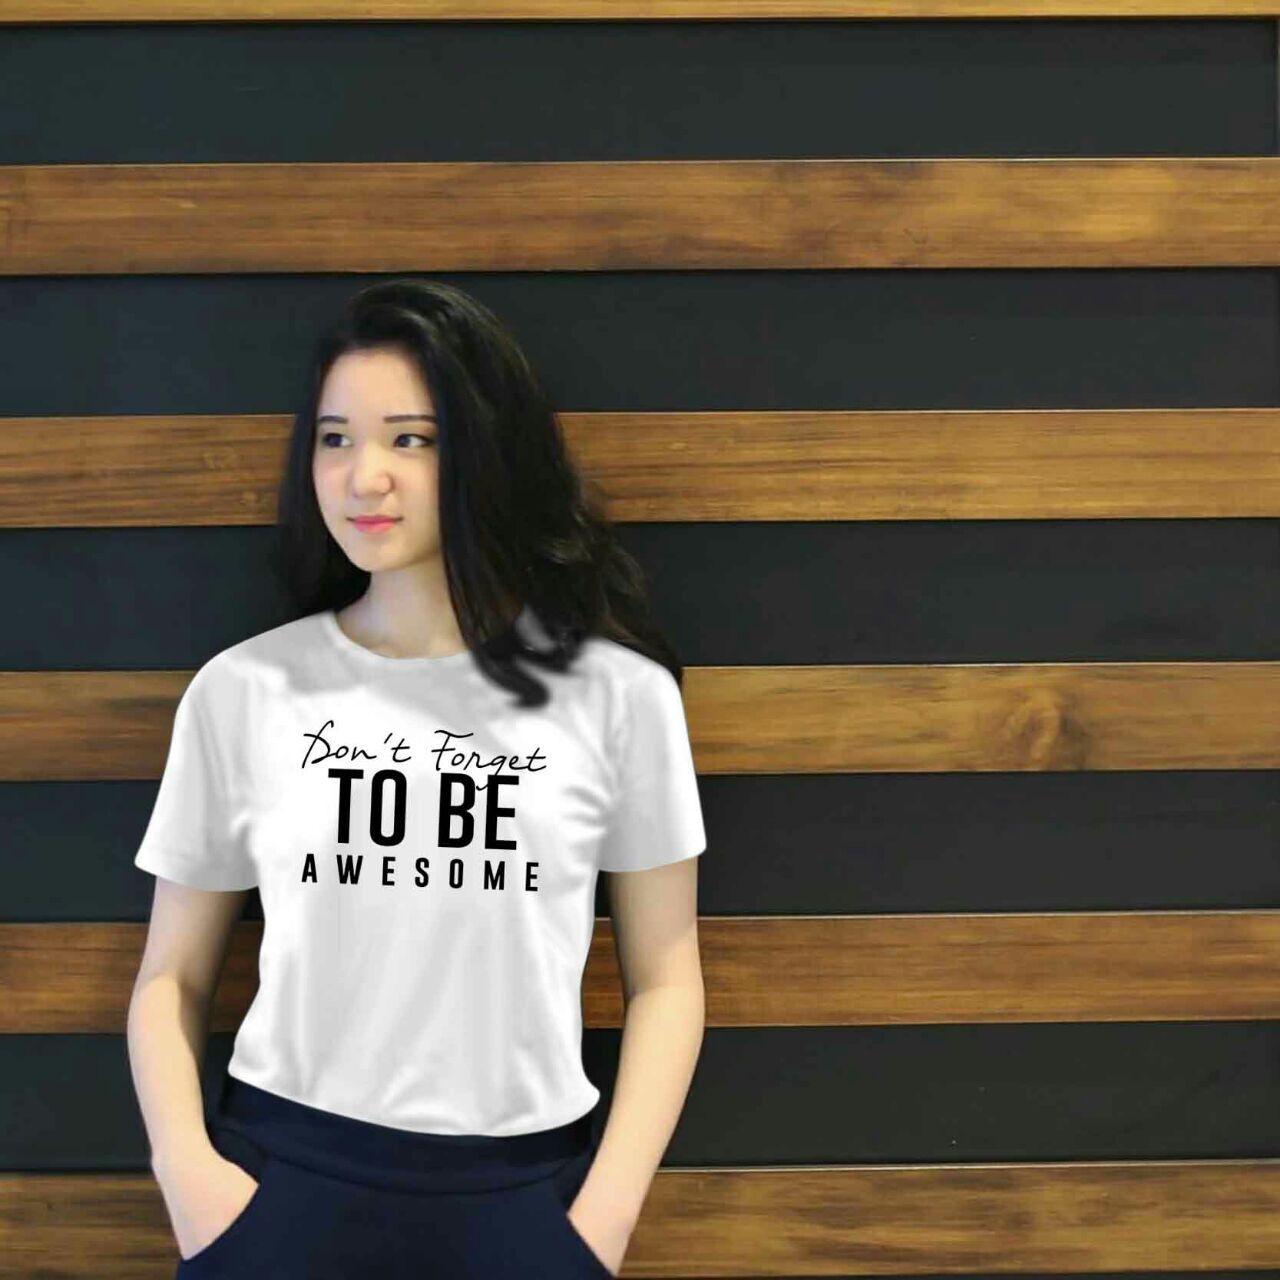 Xavier Kaos Wanita tee to be awesome / T-shirt Distro Wanita / Baju Atasan